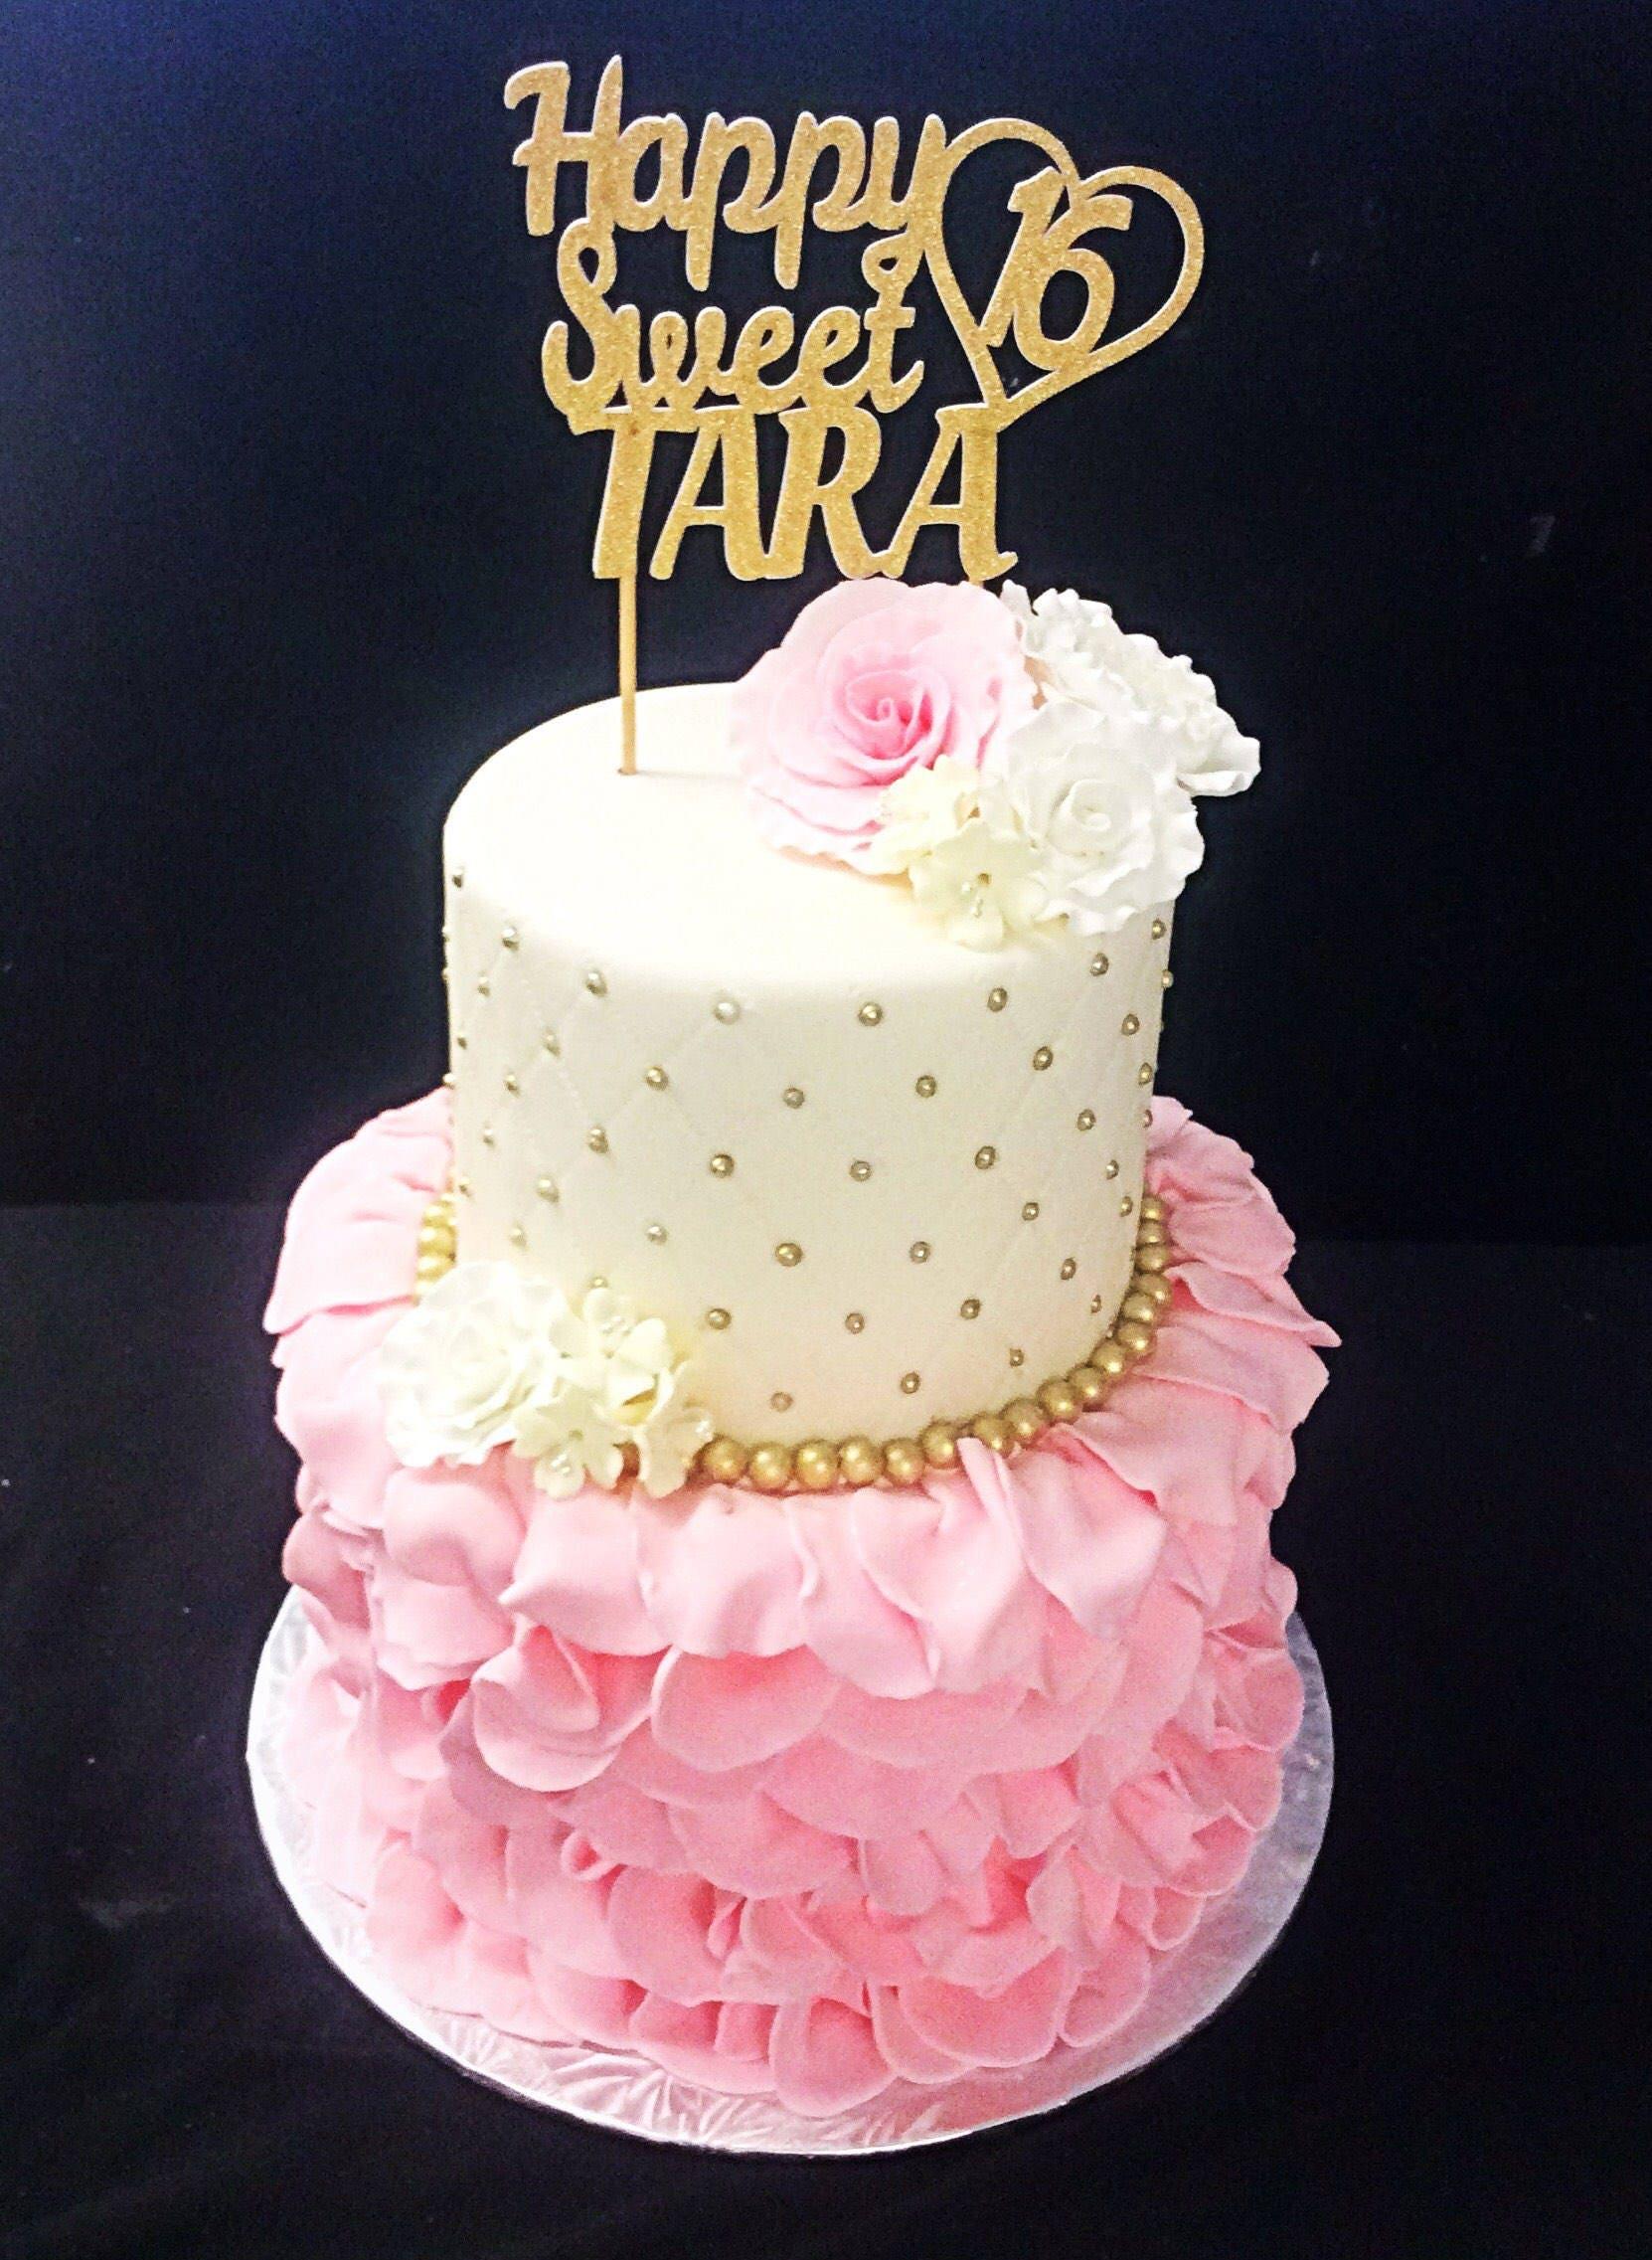 Happy Sweet 16 Birthday Cake Brithday Cake